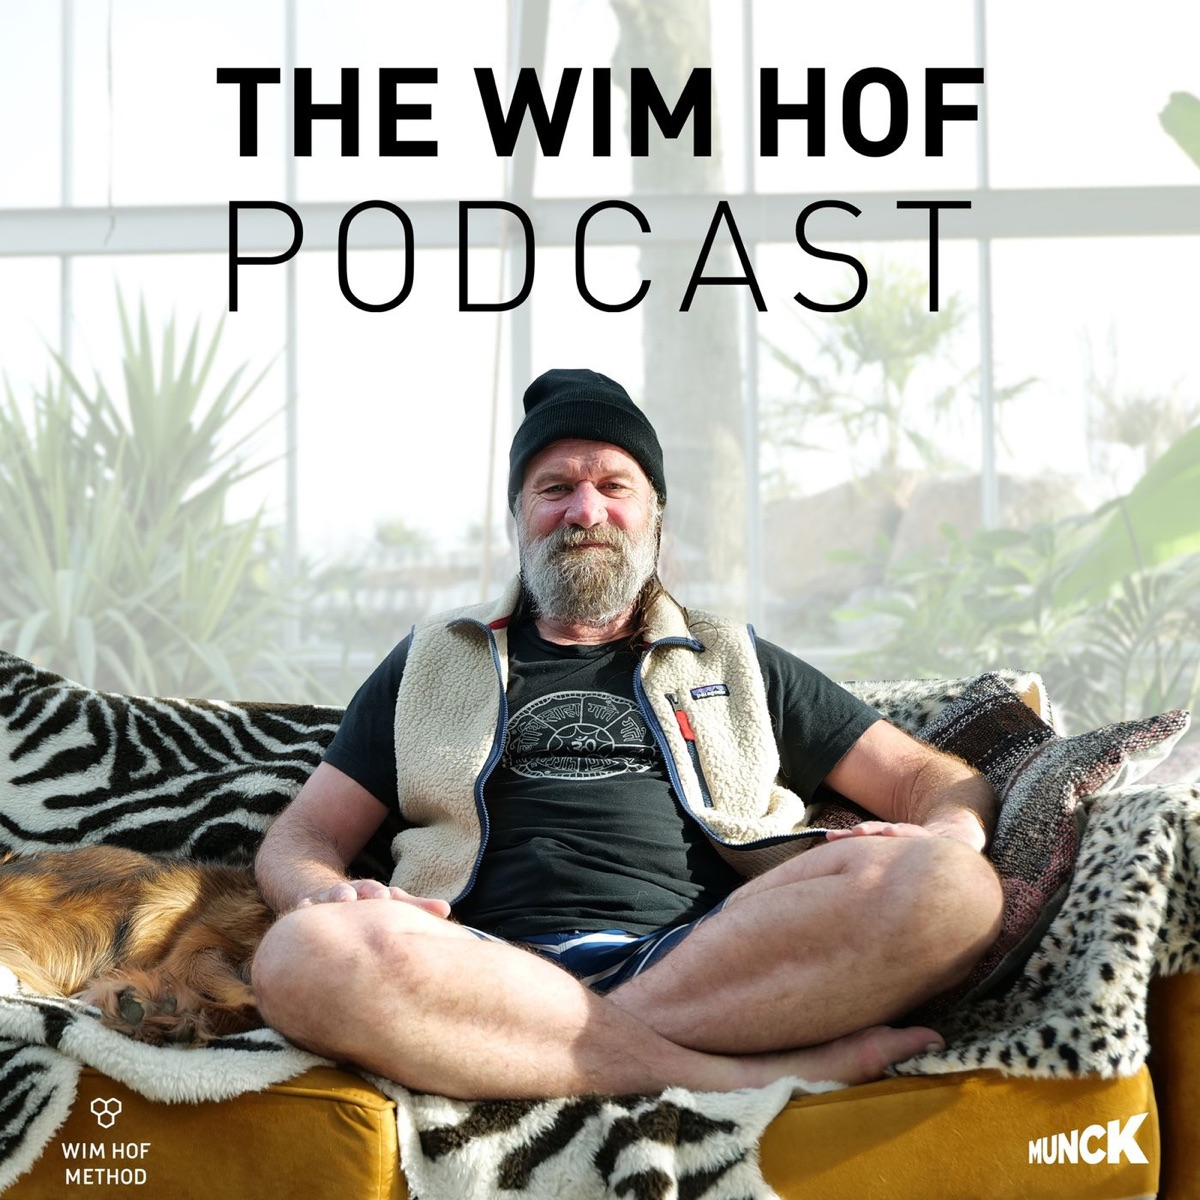 The Wim Hof Podcast